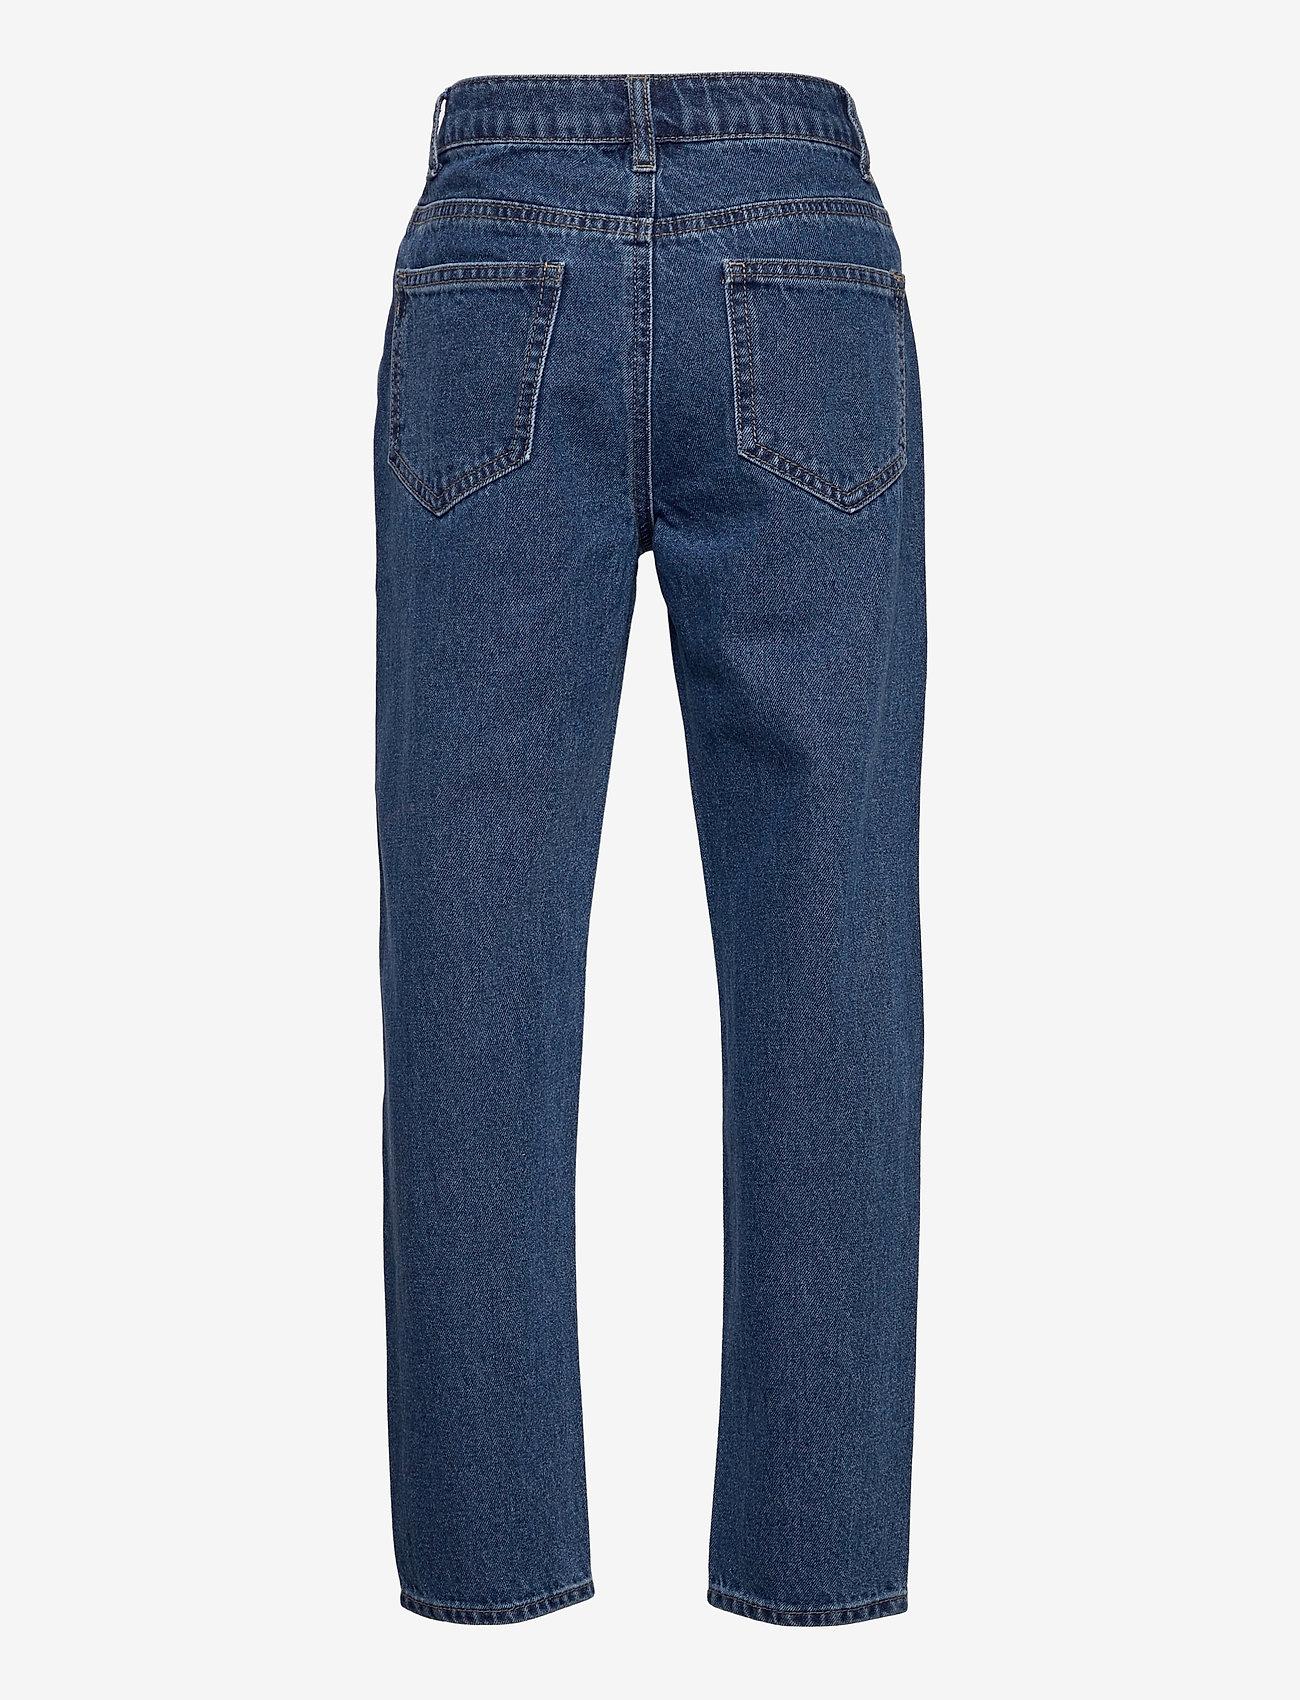 LMTD - NLFRAVEN DNMIZZA HW ANKLE PANT - jeans - medium blue denim - 1